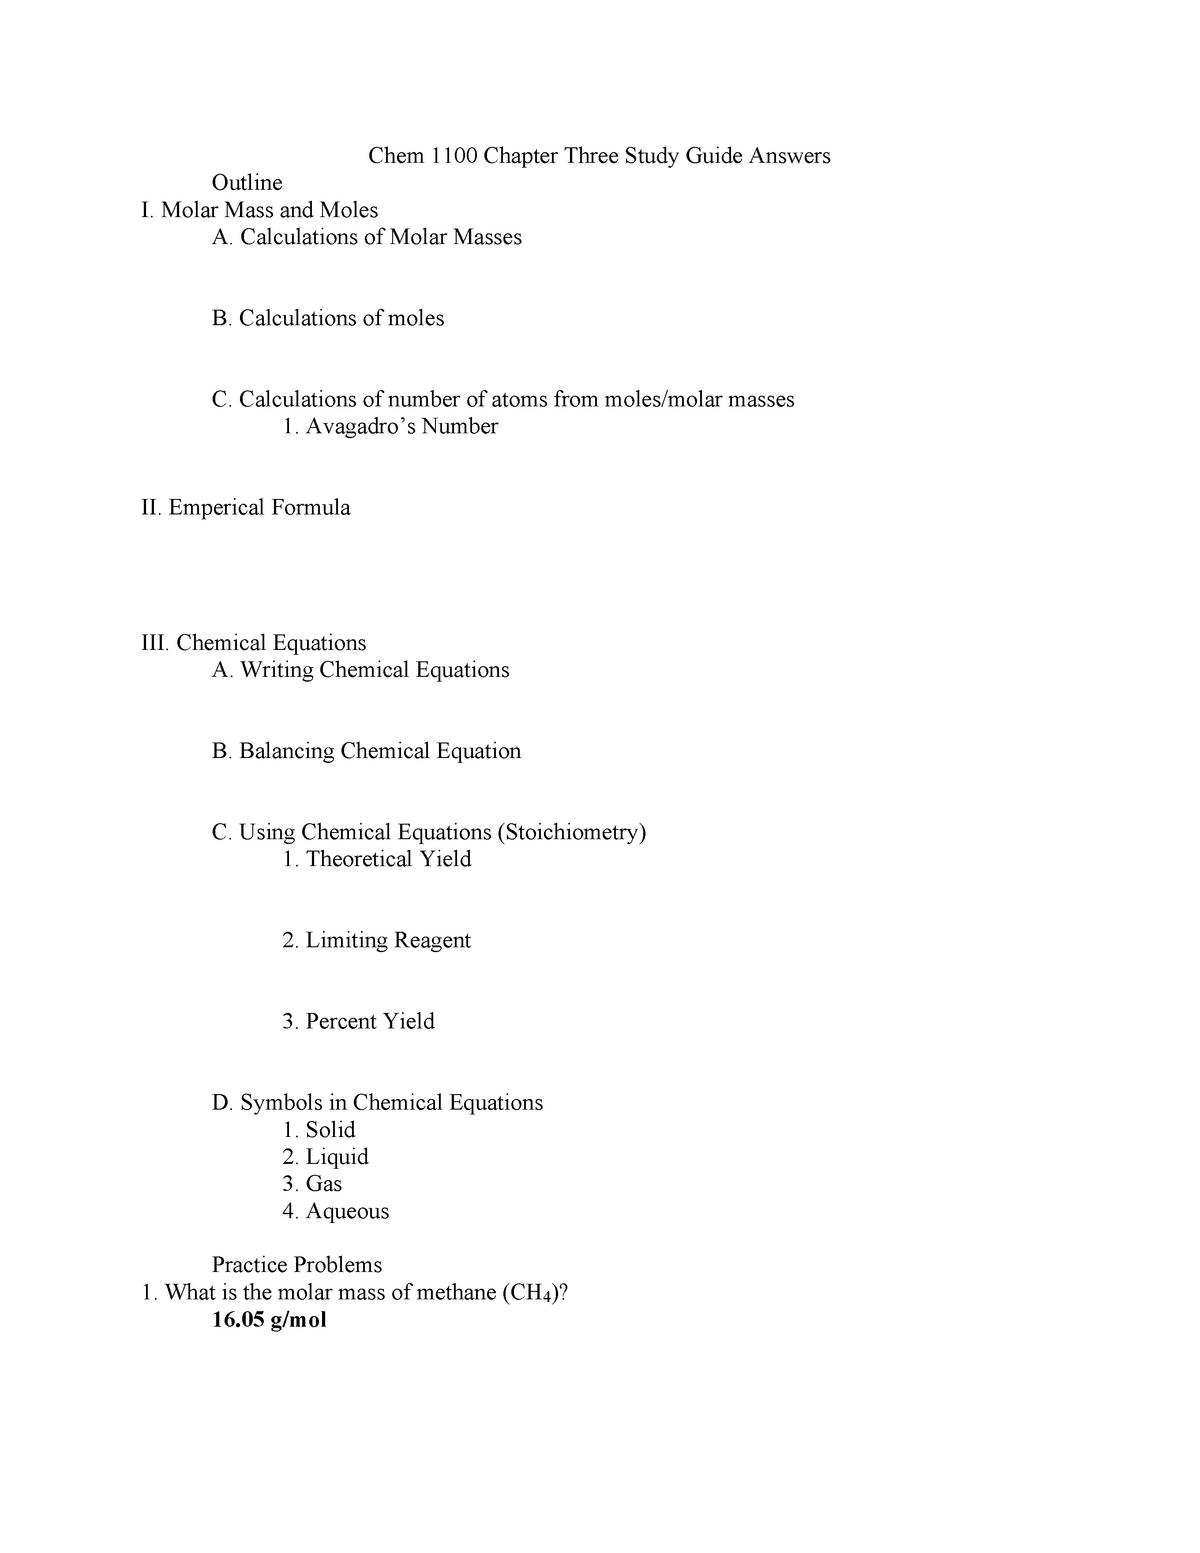 Chem 1100 study guide answers ch 3 - CHEM 1100 - WMU - StuDocu